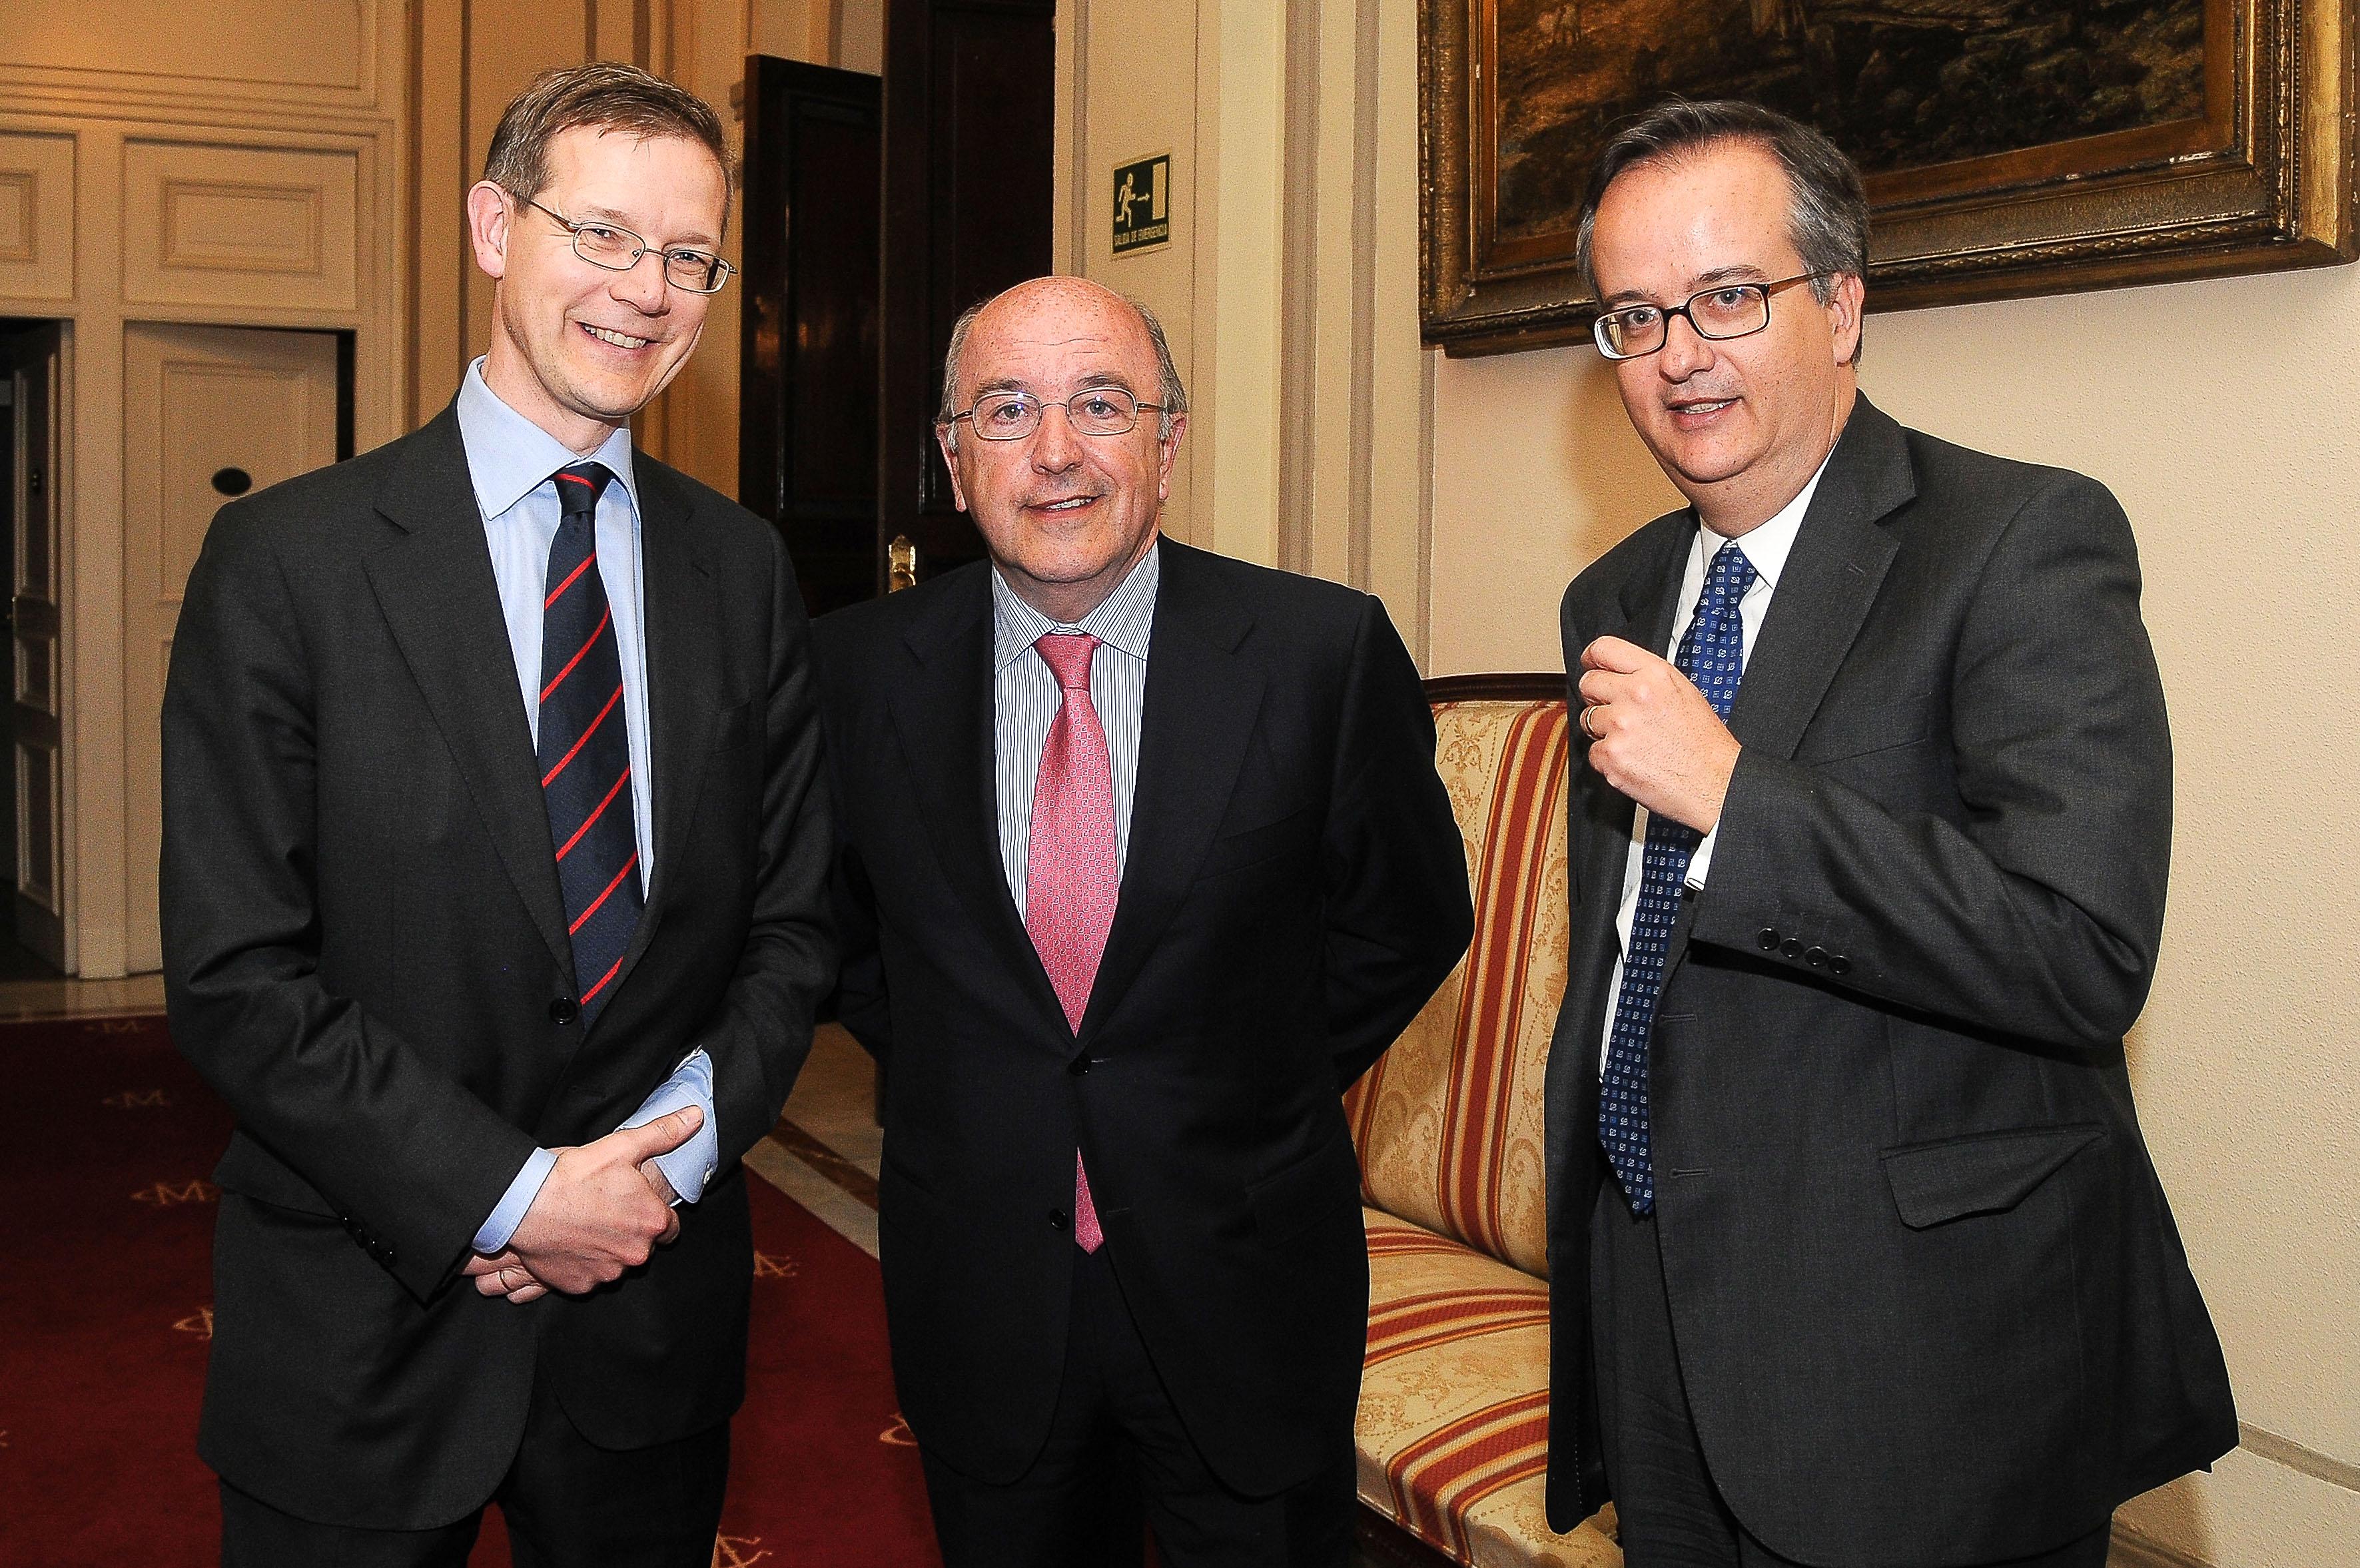 Fotografía de Joaquín Almunia Ex Presidente de la Comunidad Europea © Jorge Zorrilla Fotógrafo Madri